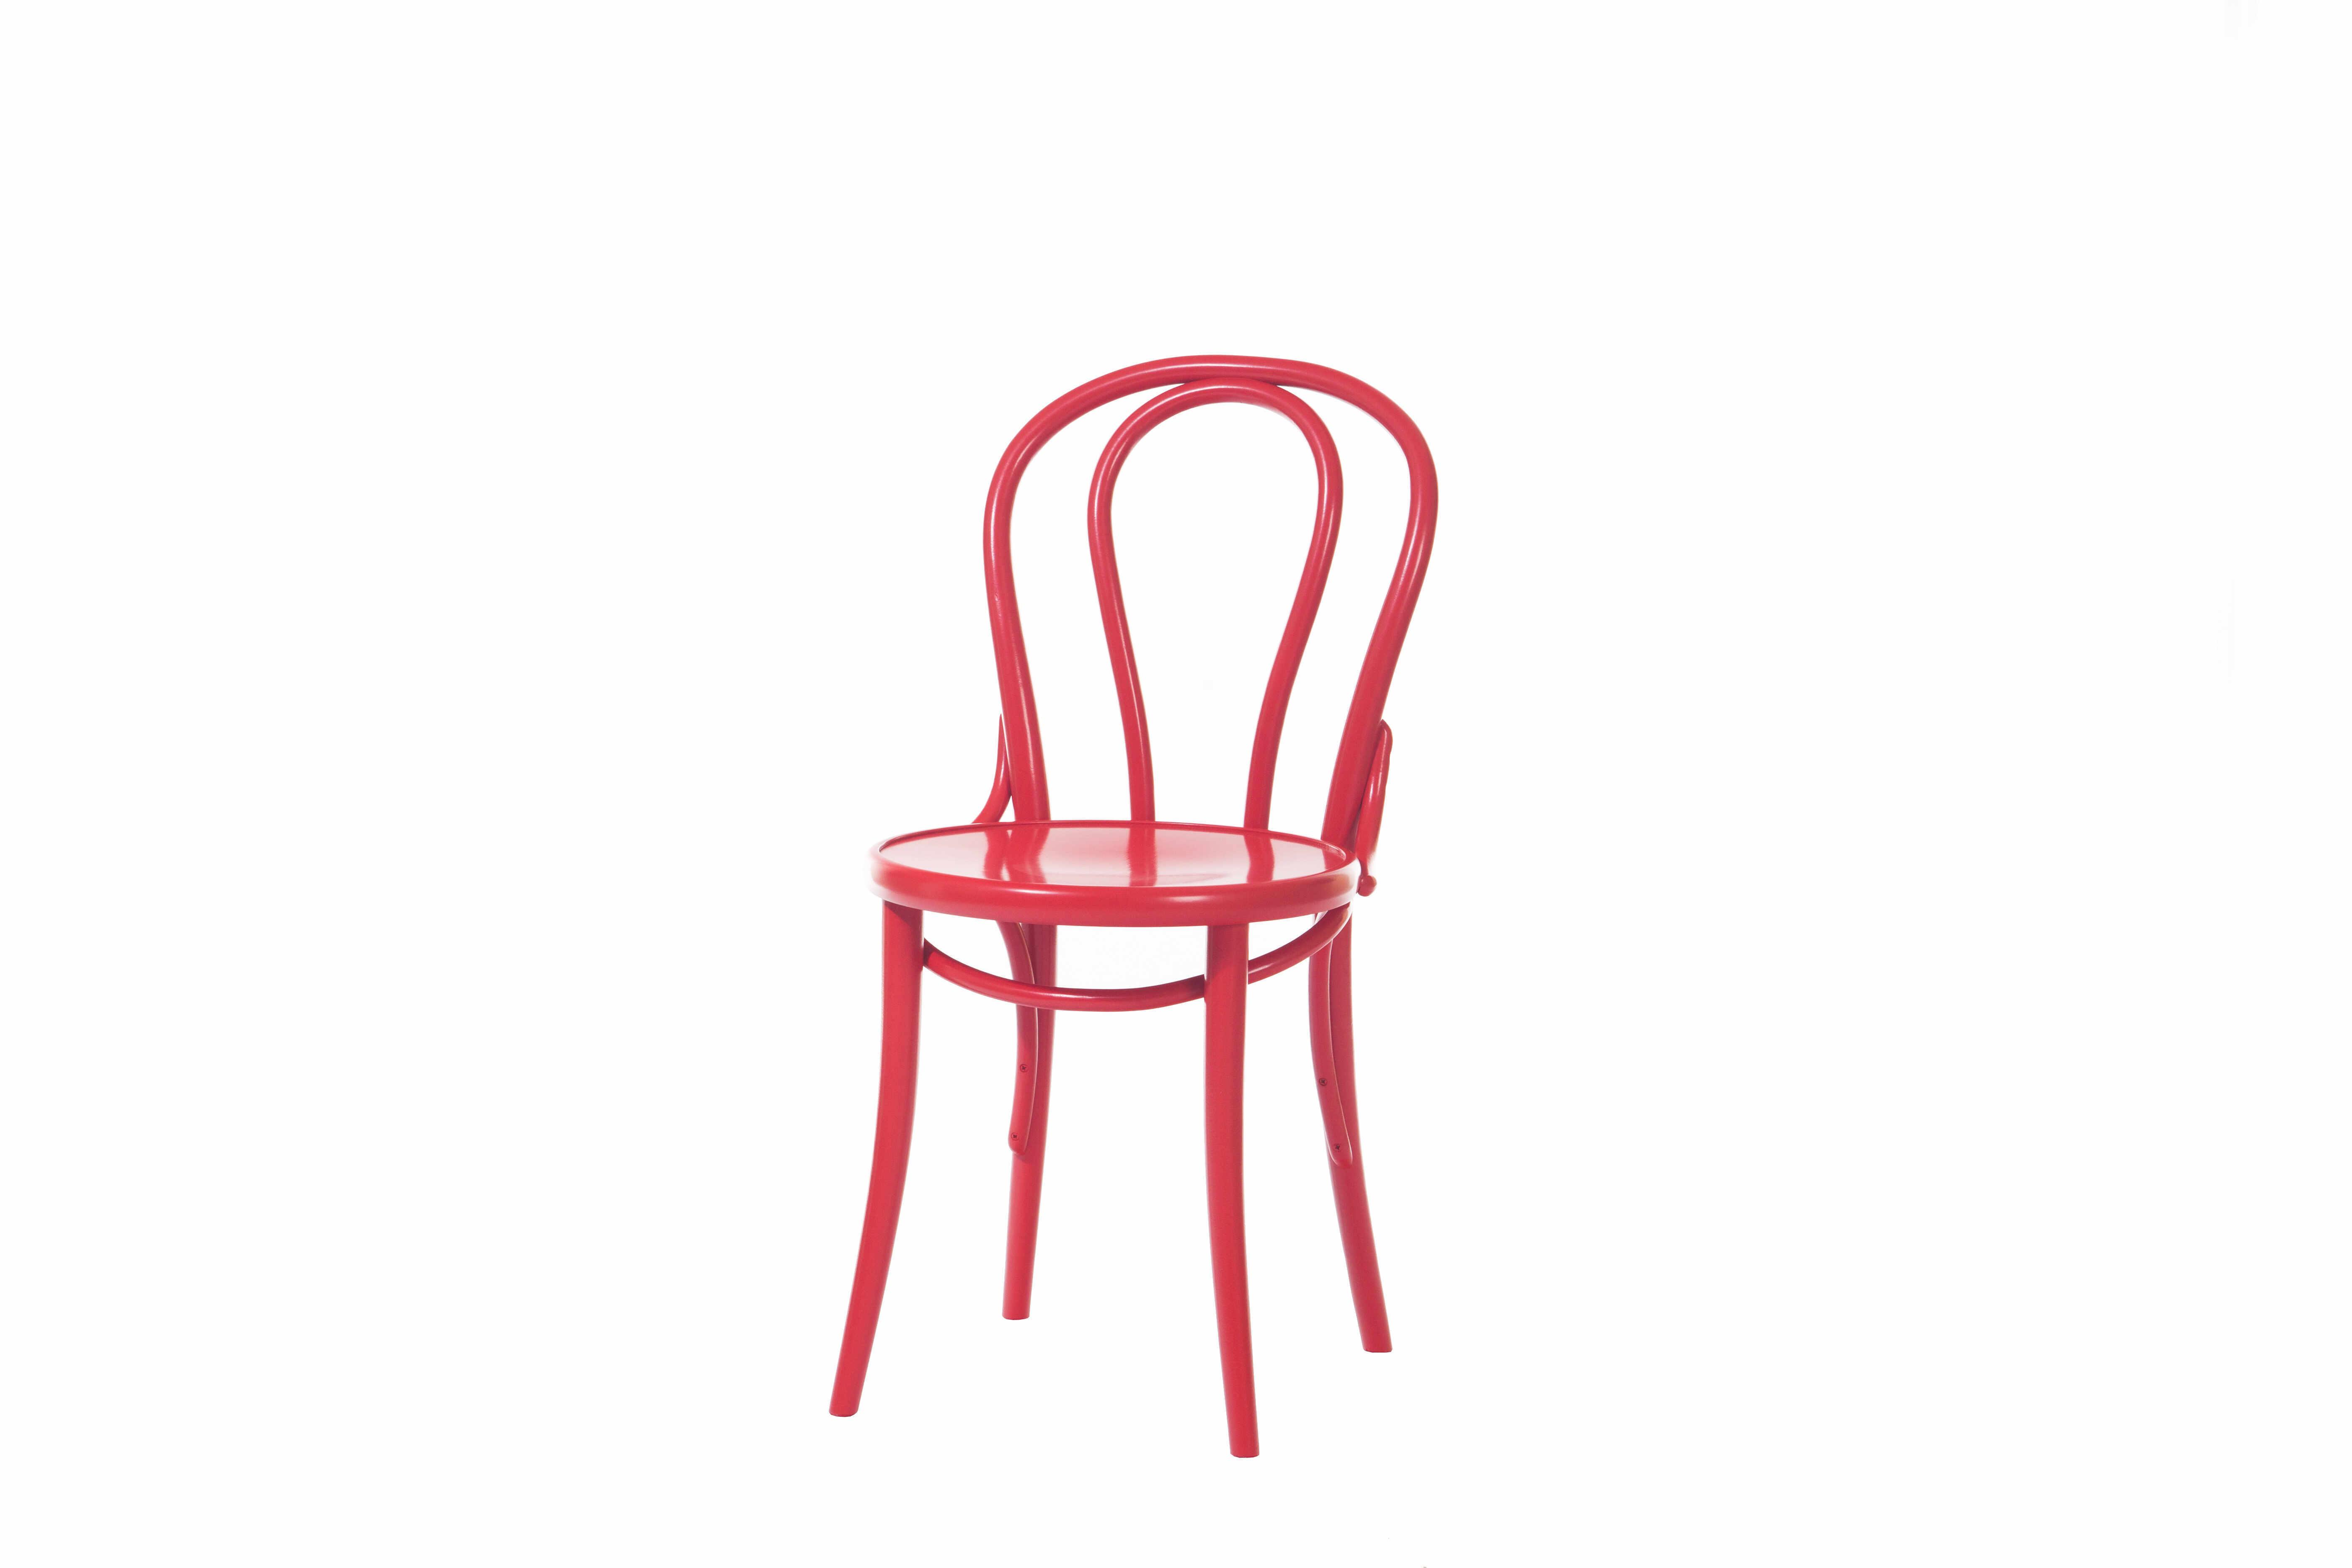 Scaun din lemn de fag 18 Red, l41xA51,5xH84 cm la pret 1161 lei